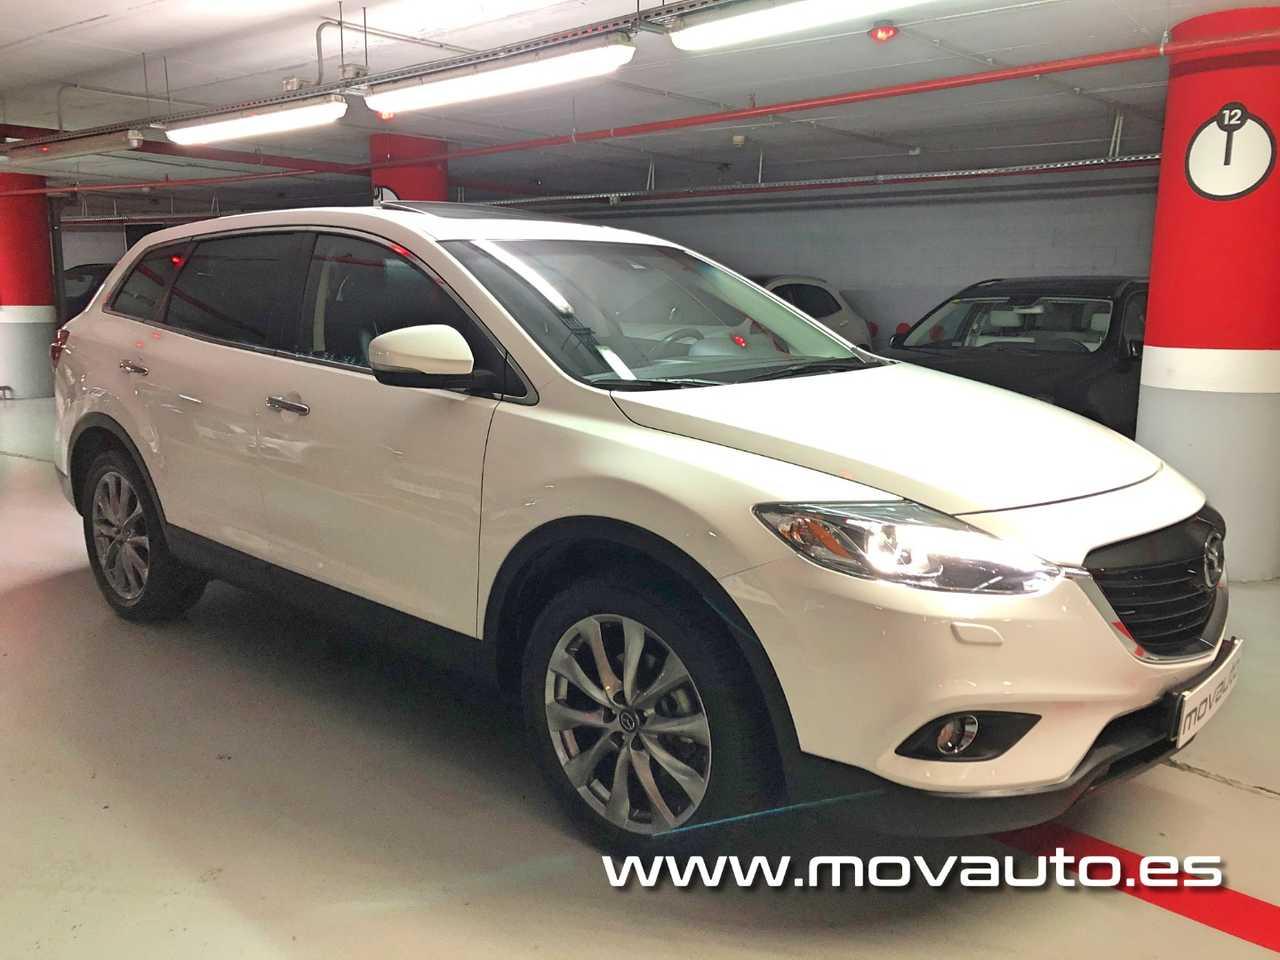 Mazda CX-9 3.7 275cv 6AT 4WD Luxury   - Foto 1